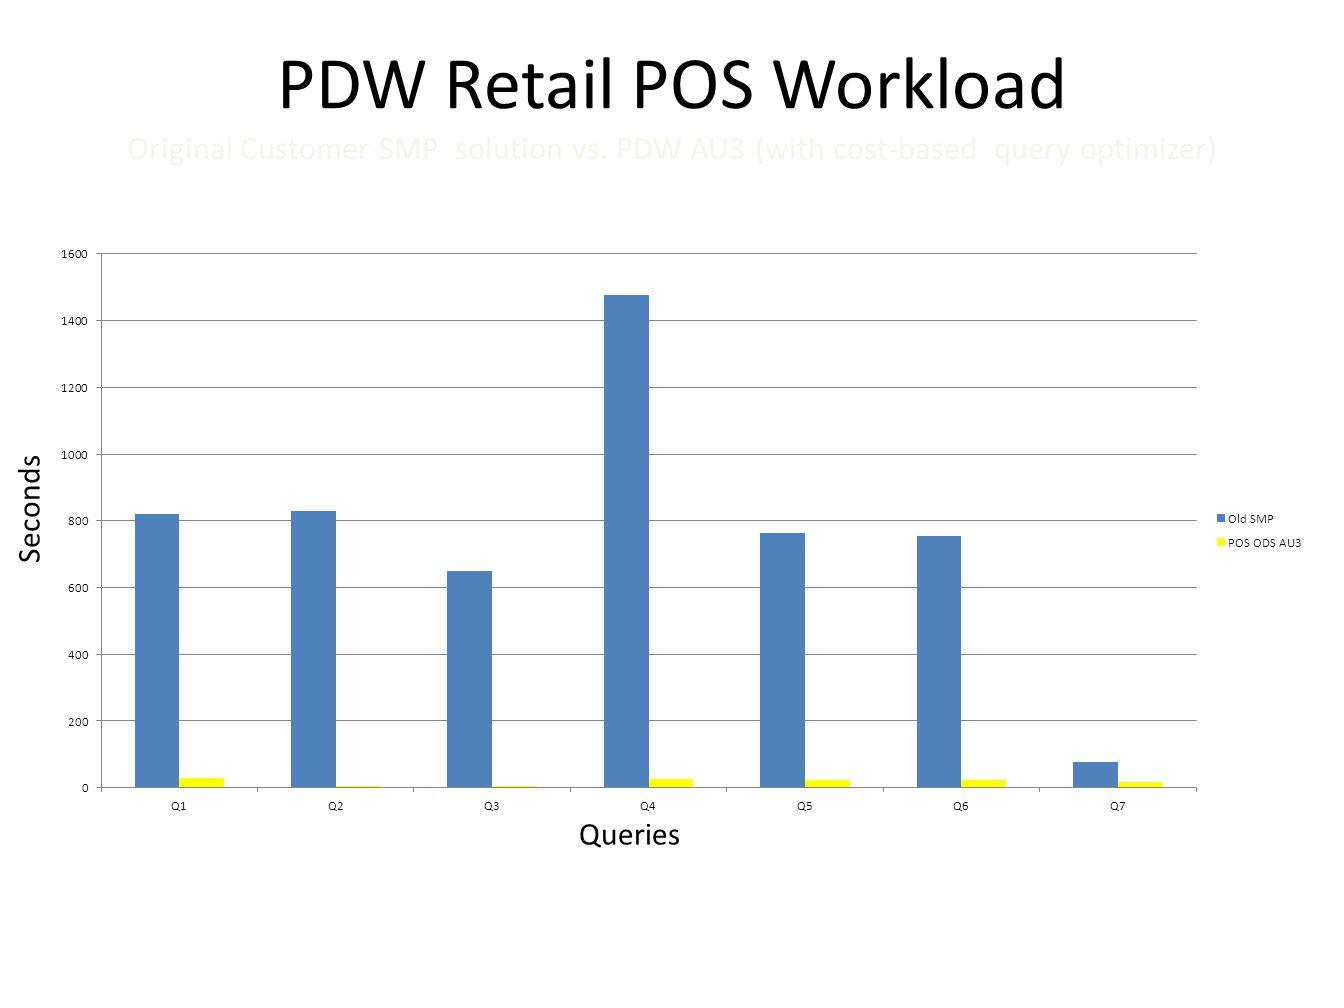 PDW Retail POS Workload Original Customer SMP solution vs.